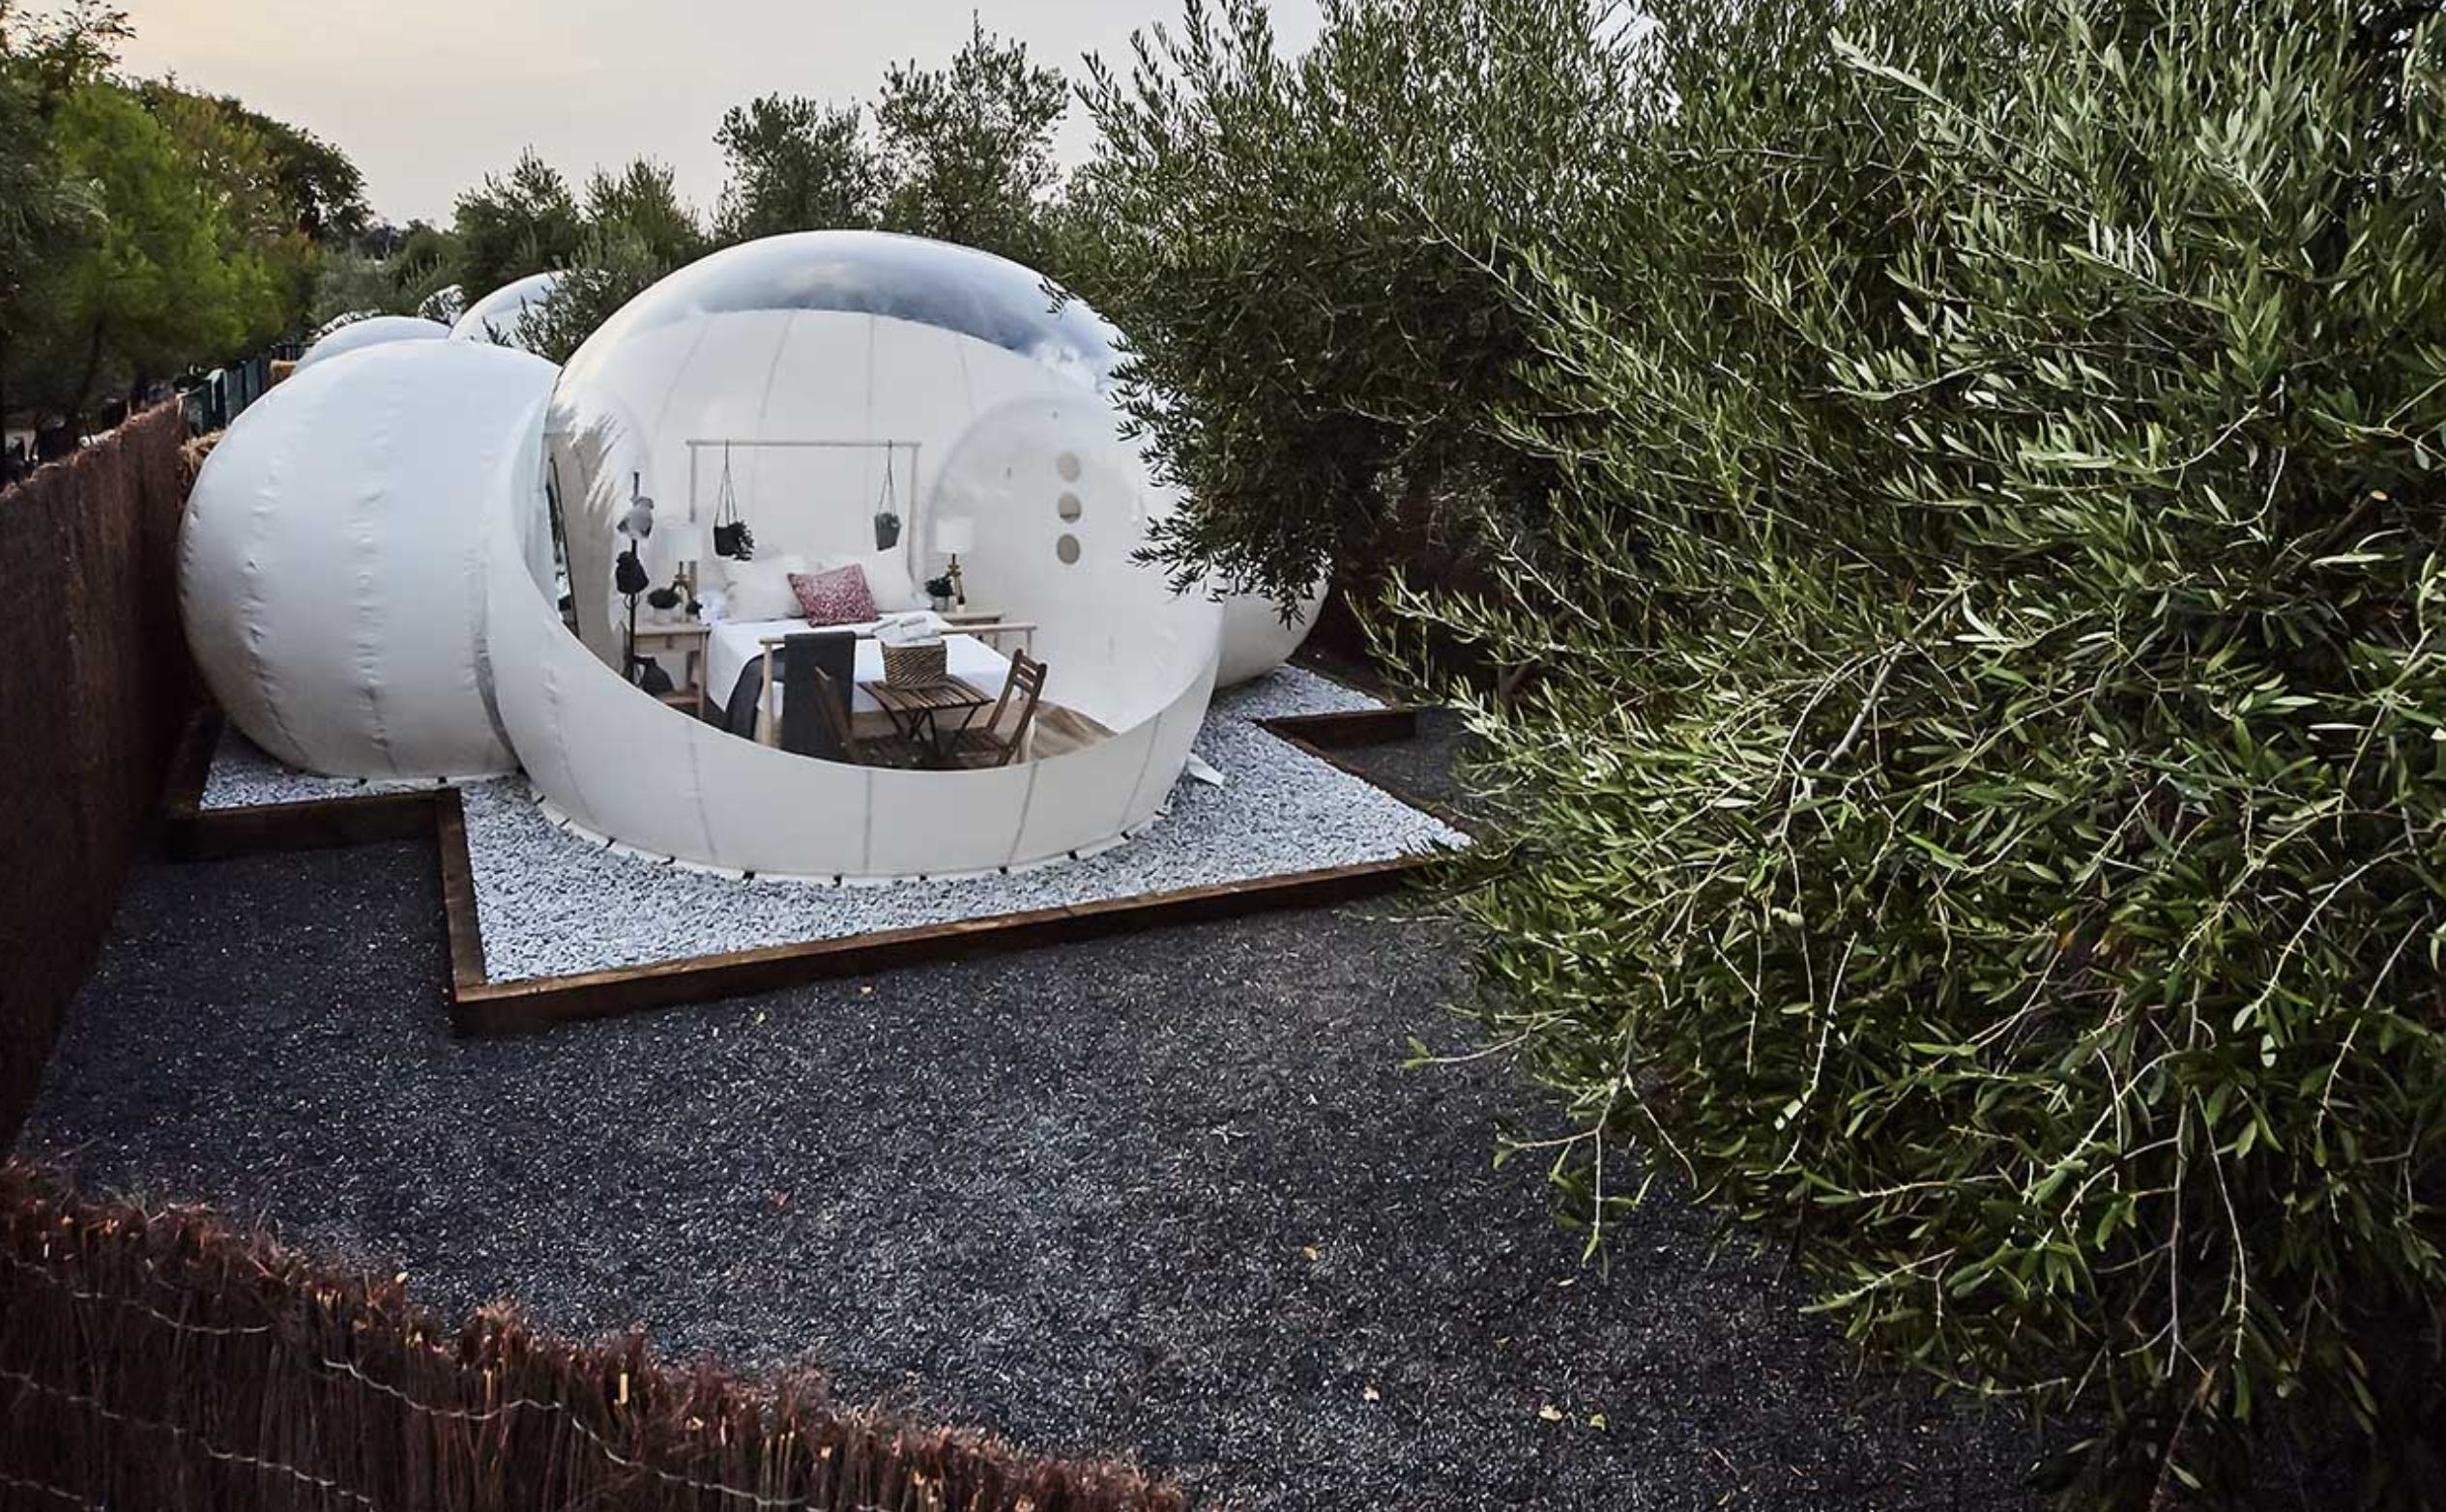 Nomading Camp Ronda. Hotel burbuja